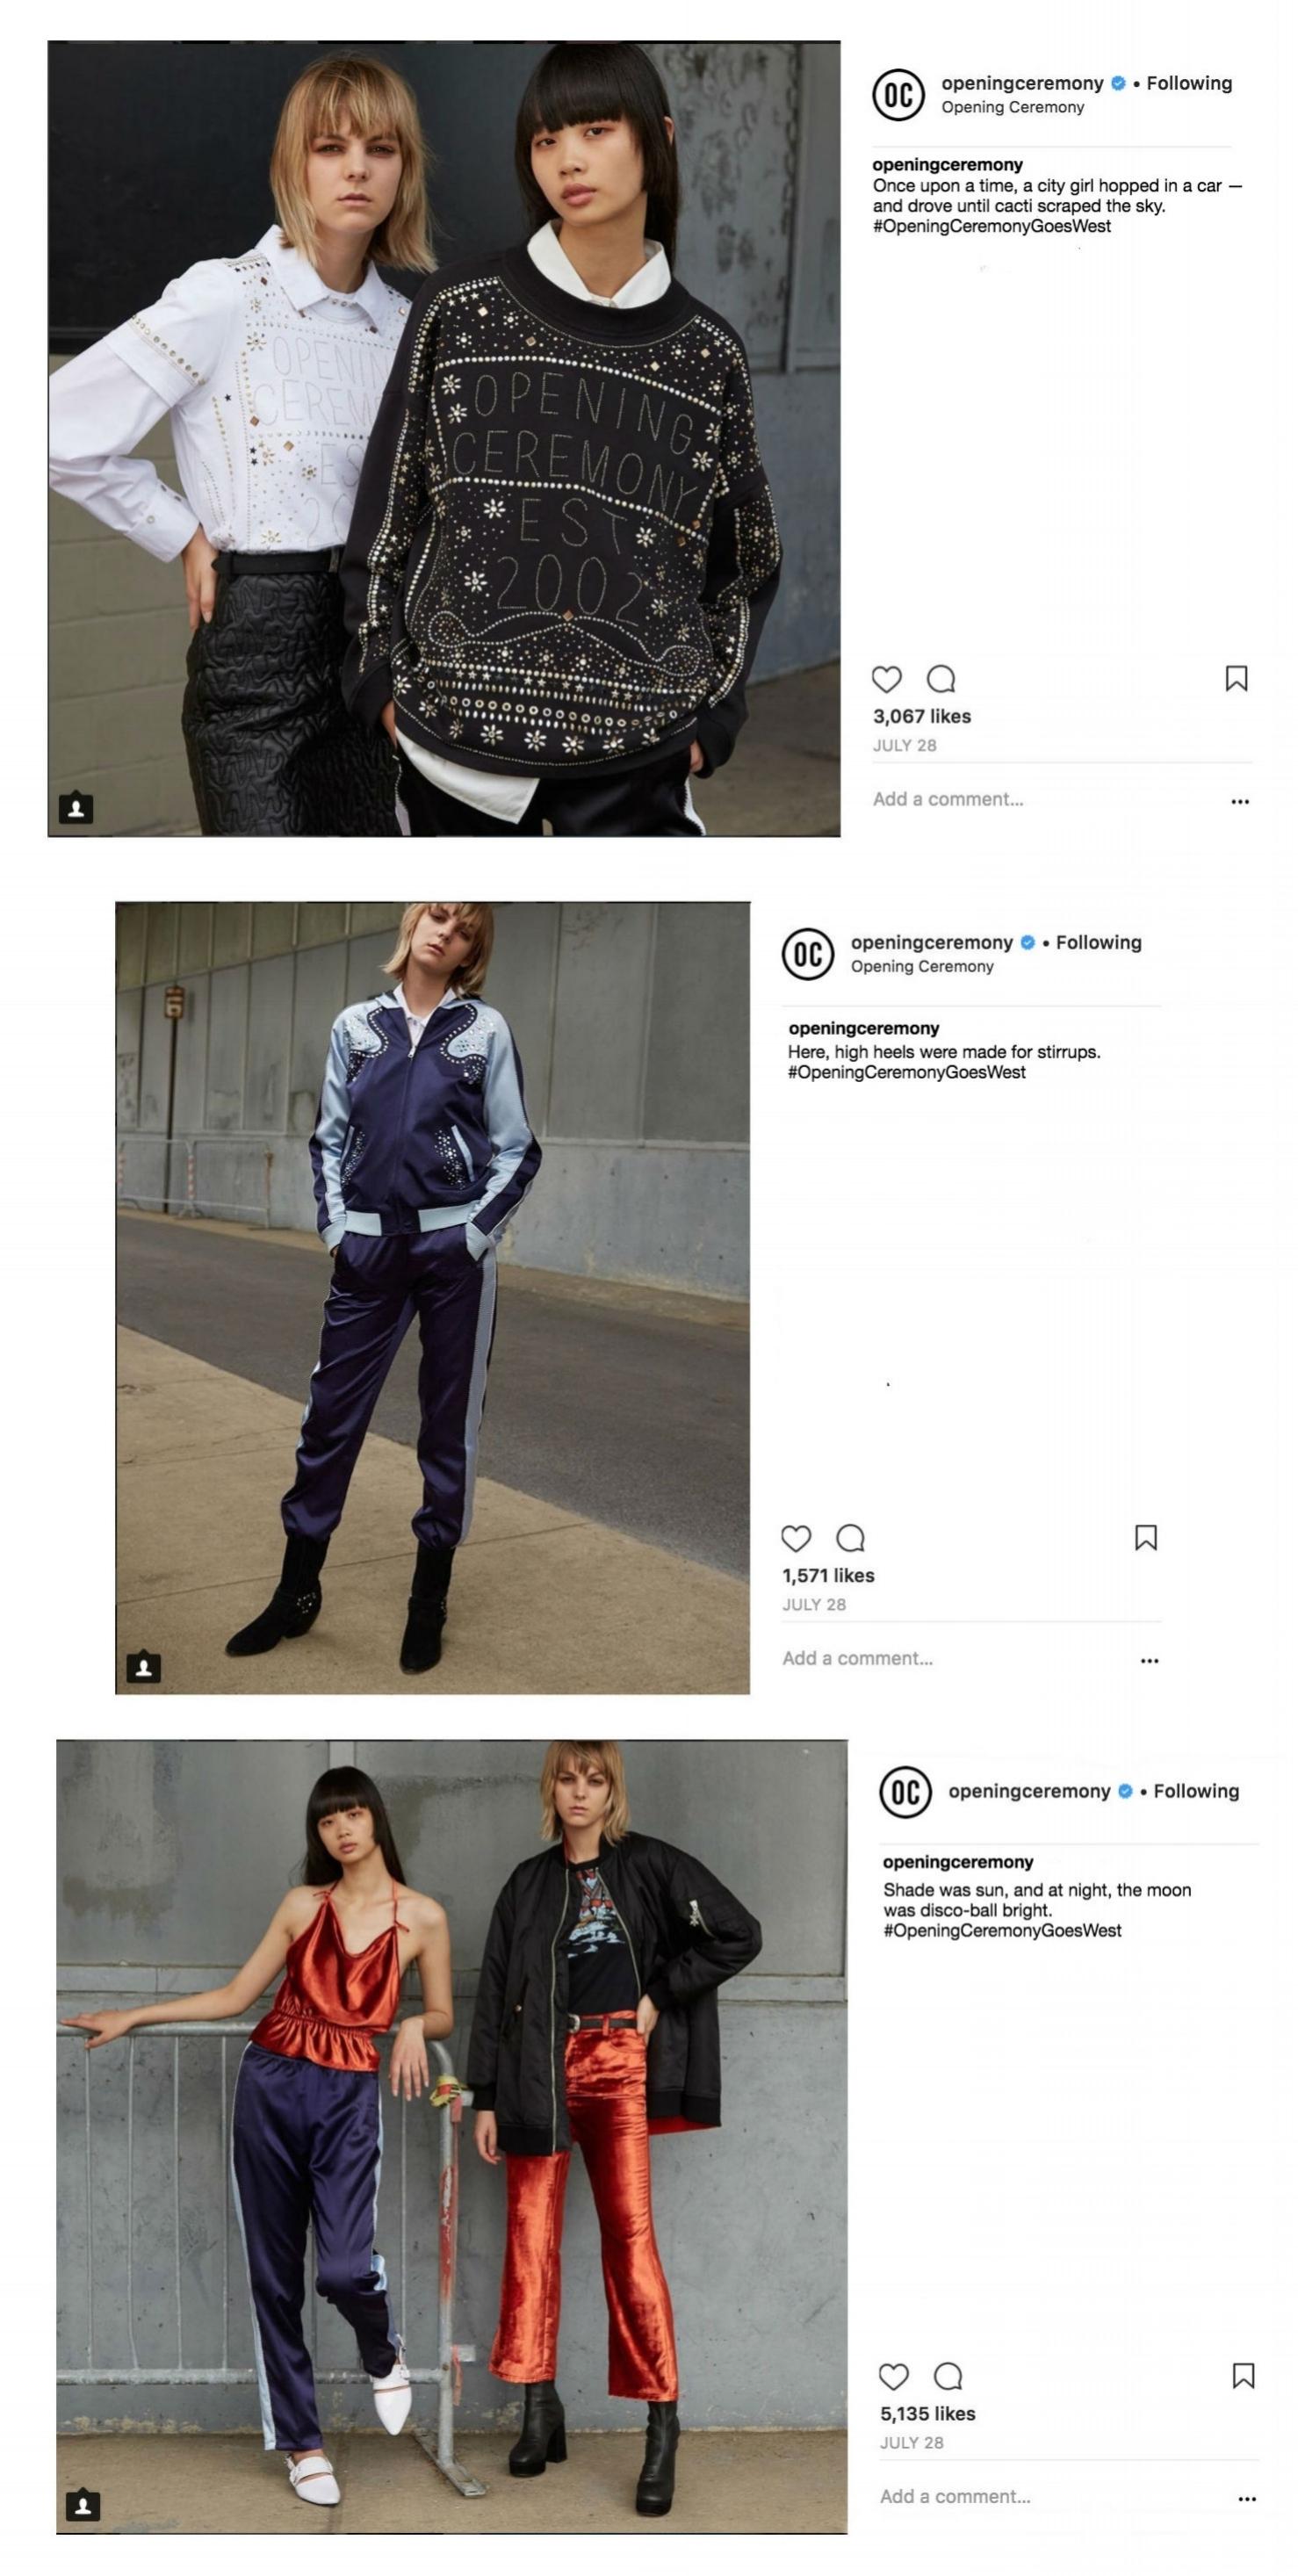 Opening Ceremony - Instagram Captions - 2017.jpg